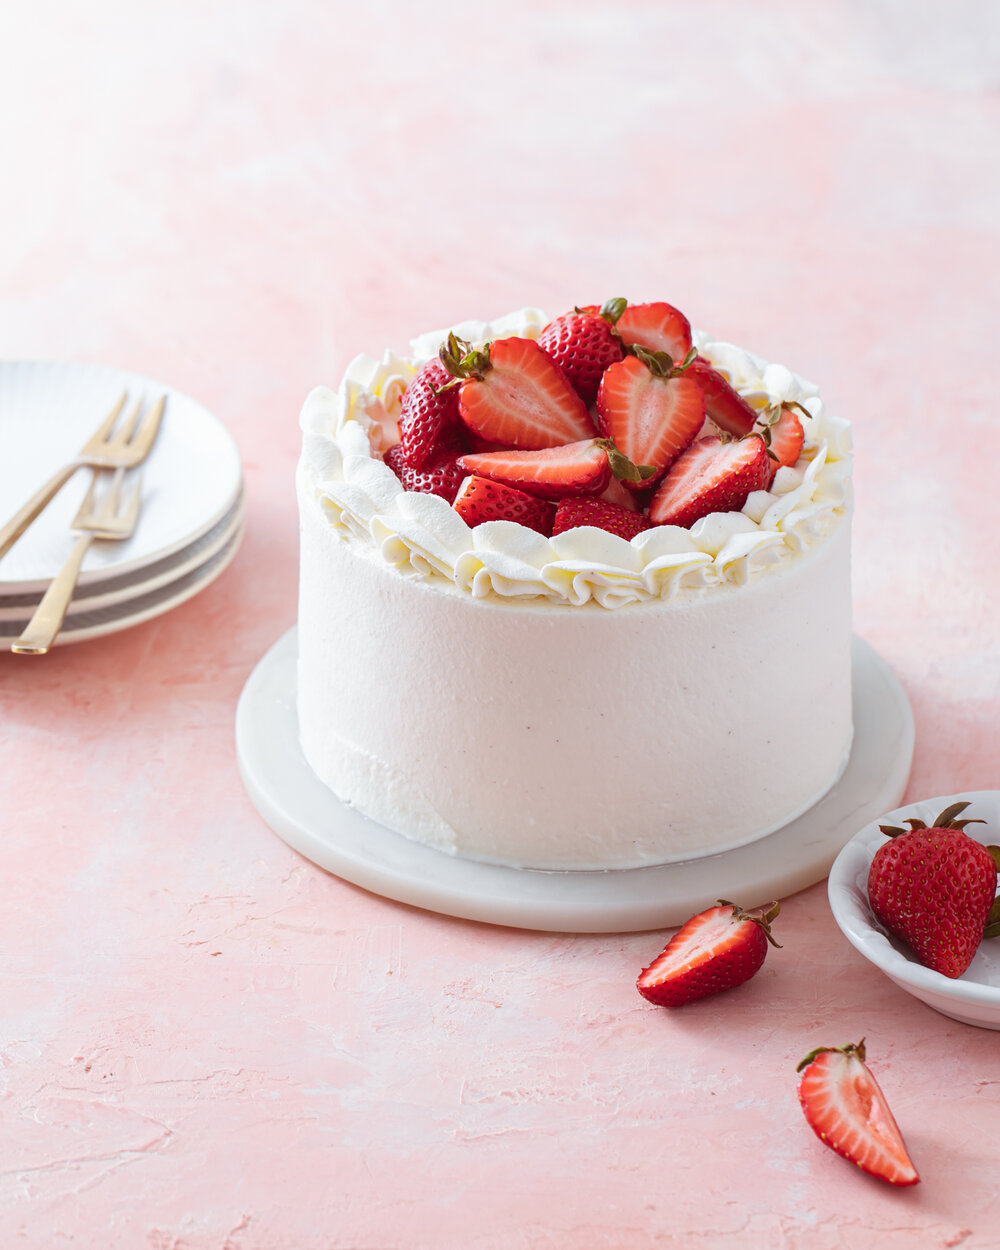 Mini Strawberry Chiffon Cake with whipped cream